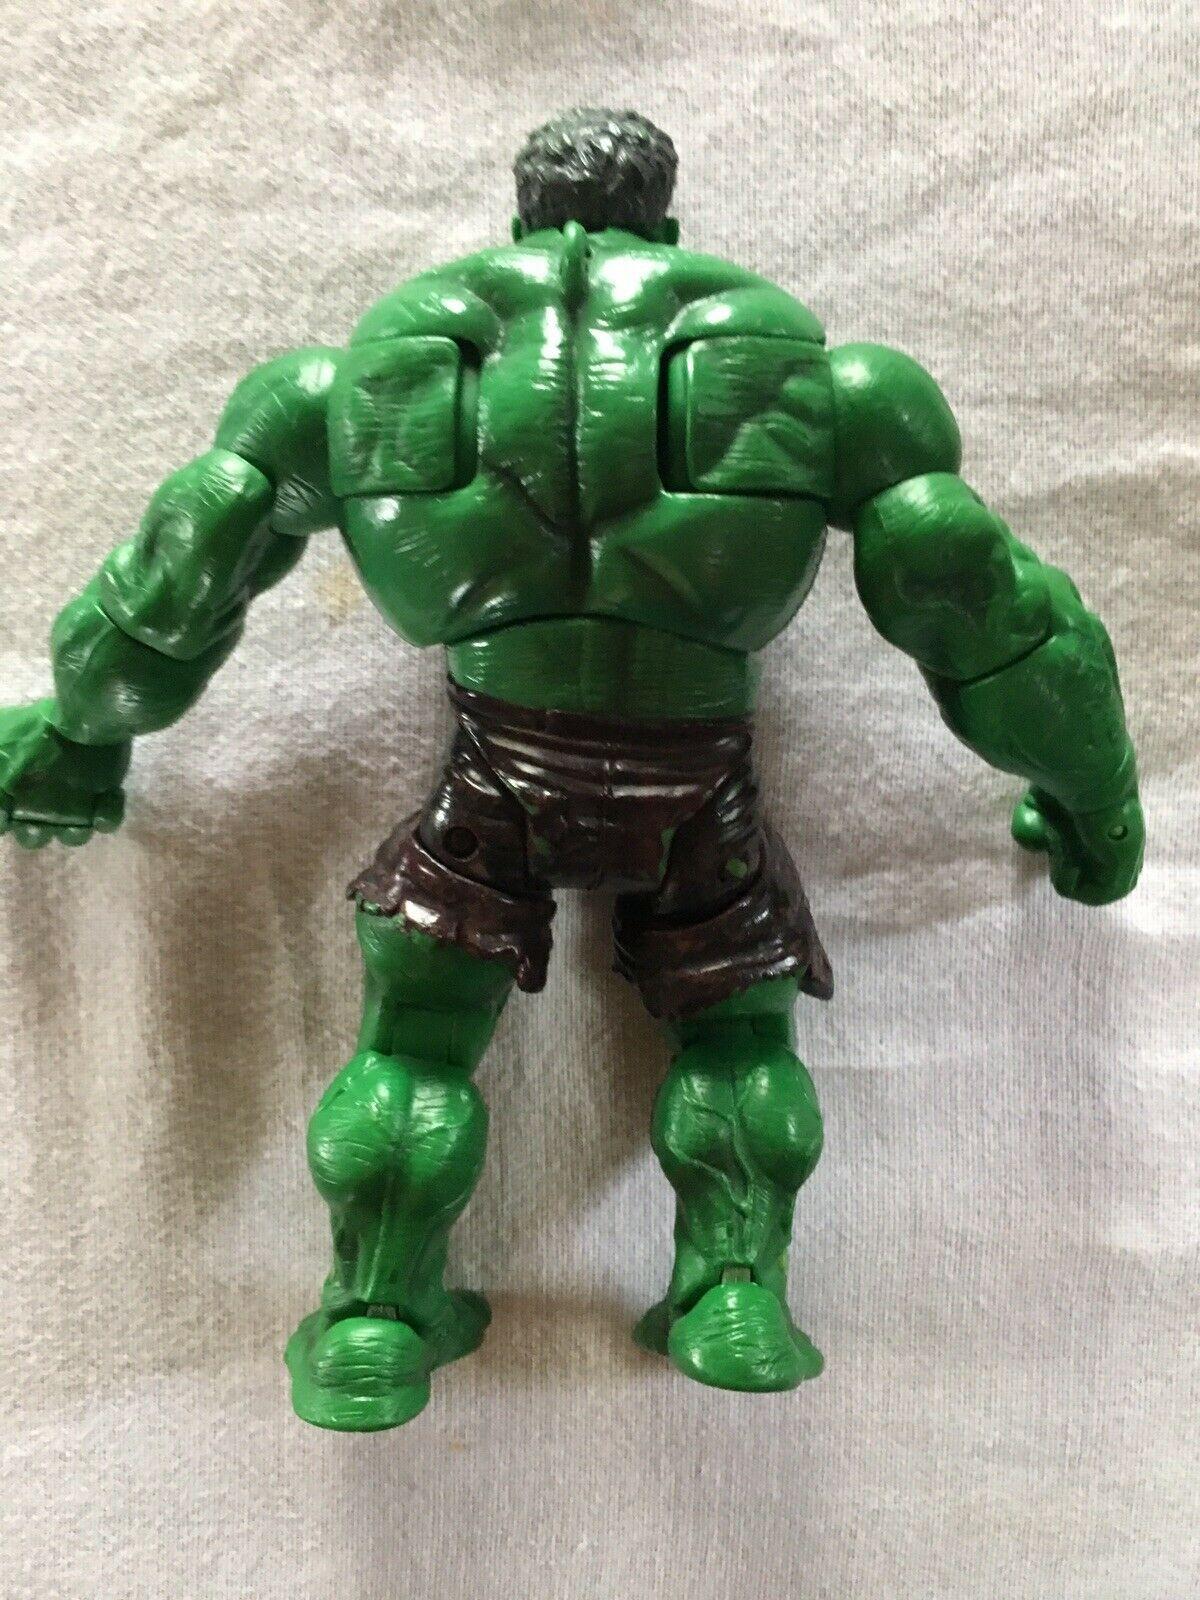 2002 Incredible Hulk action figure image 3